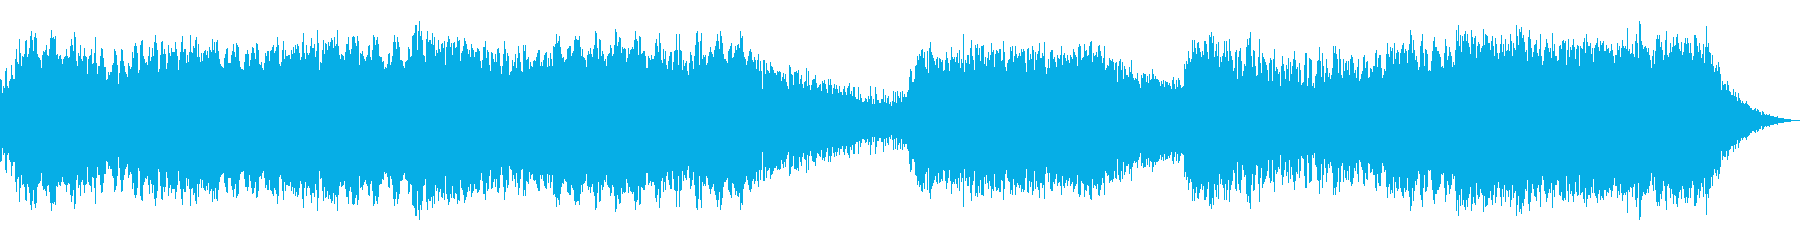 Unearthly Transfo...の再生済みの波形